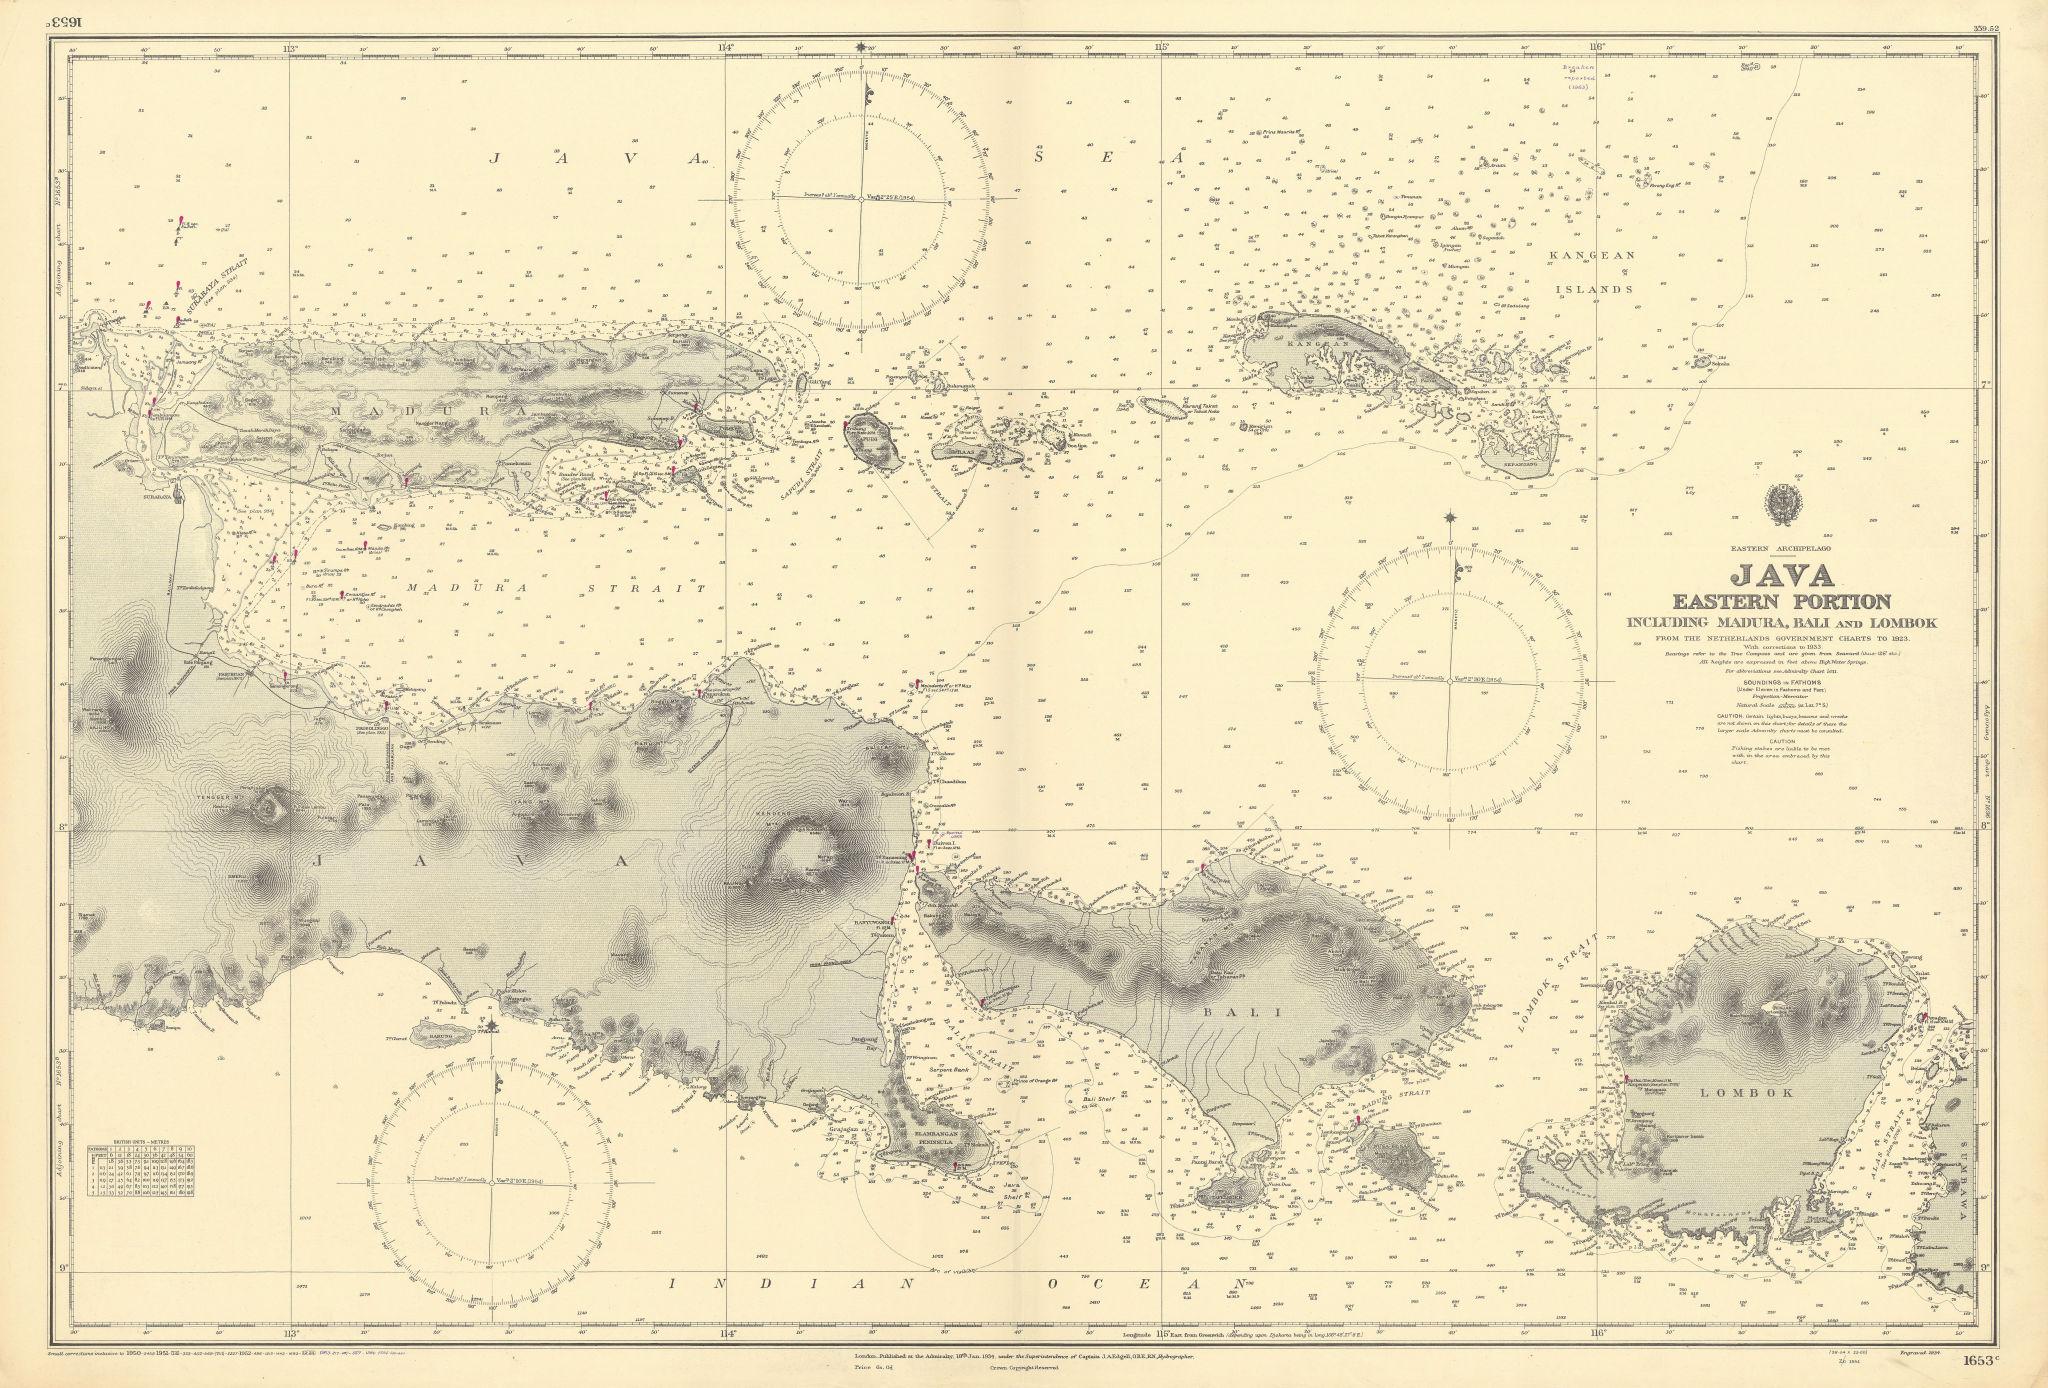 Eastern Java Madura Bali Lombok. Indonesia. ADMIRALTY sea chart 1934 (1954) map